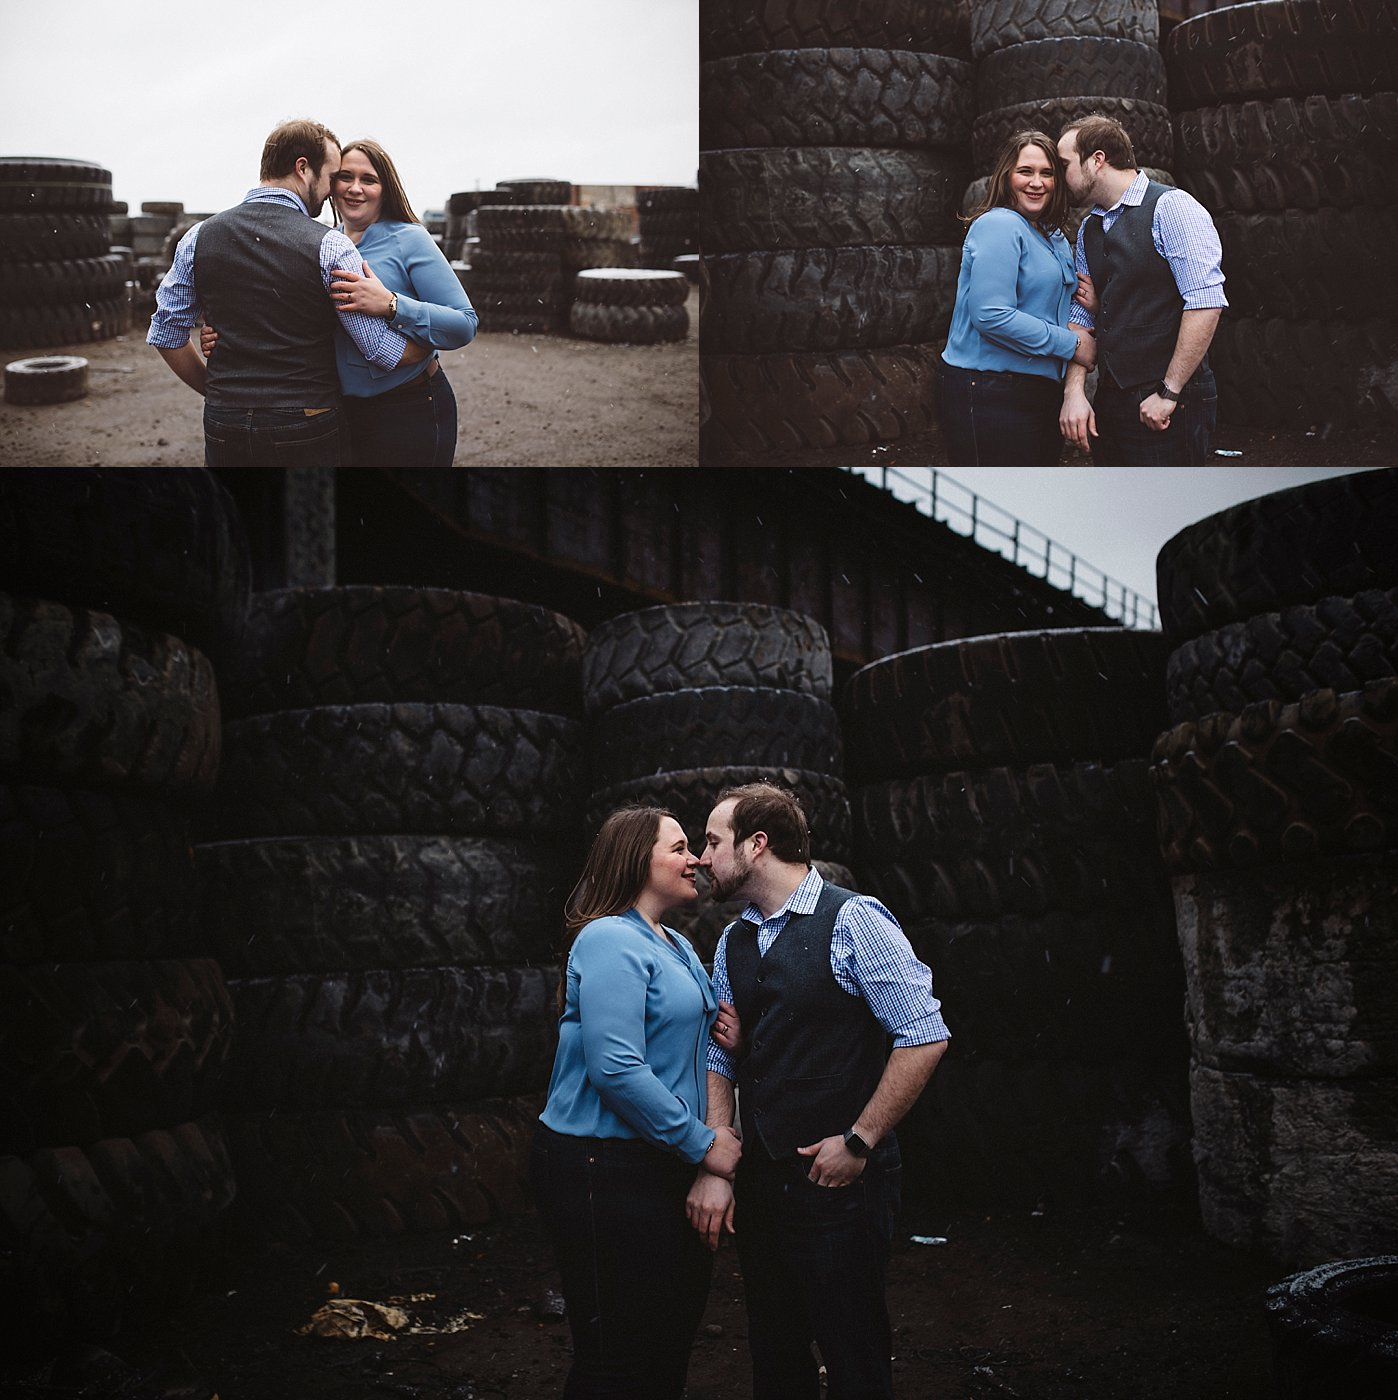 Tire yard Engagement | Sandrachile.com